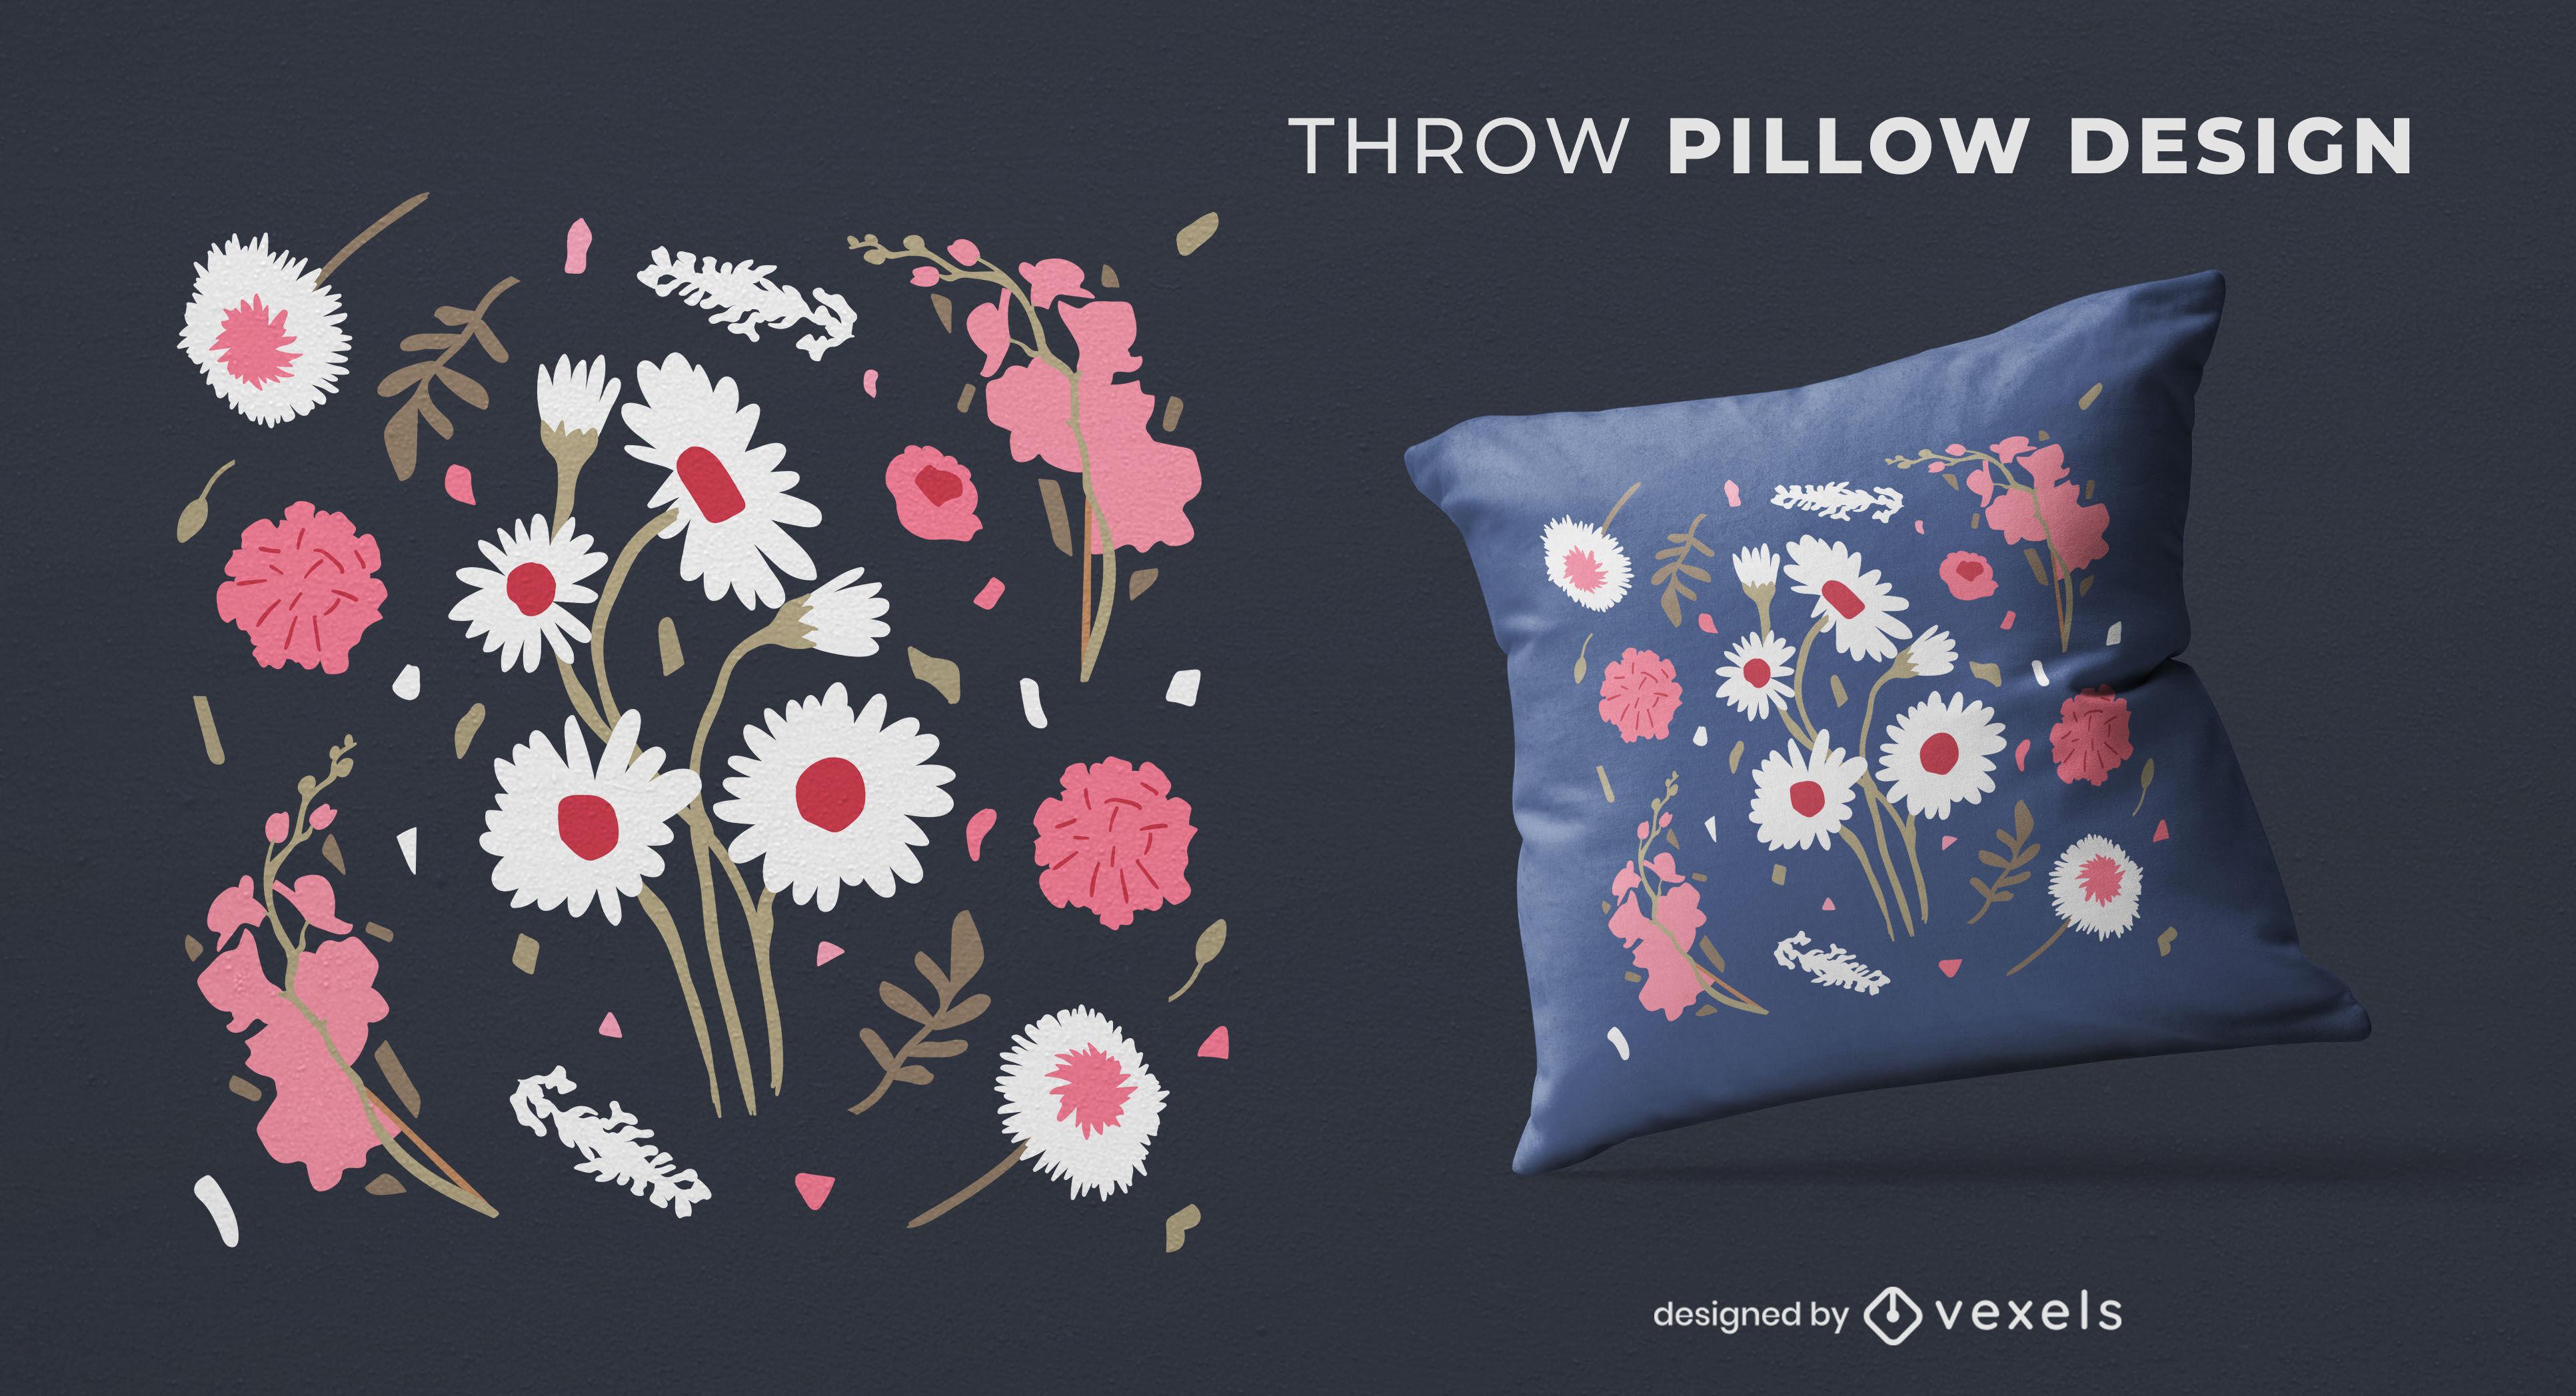 Diseño de almohada de tiro de flores de primavera